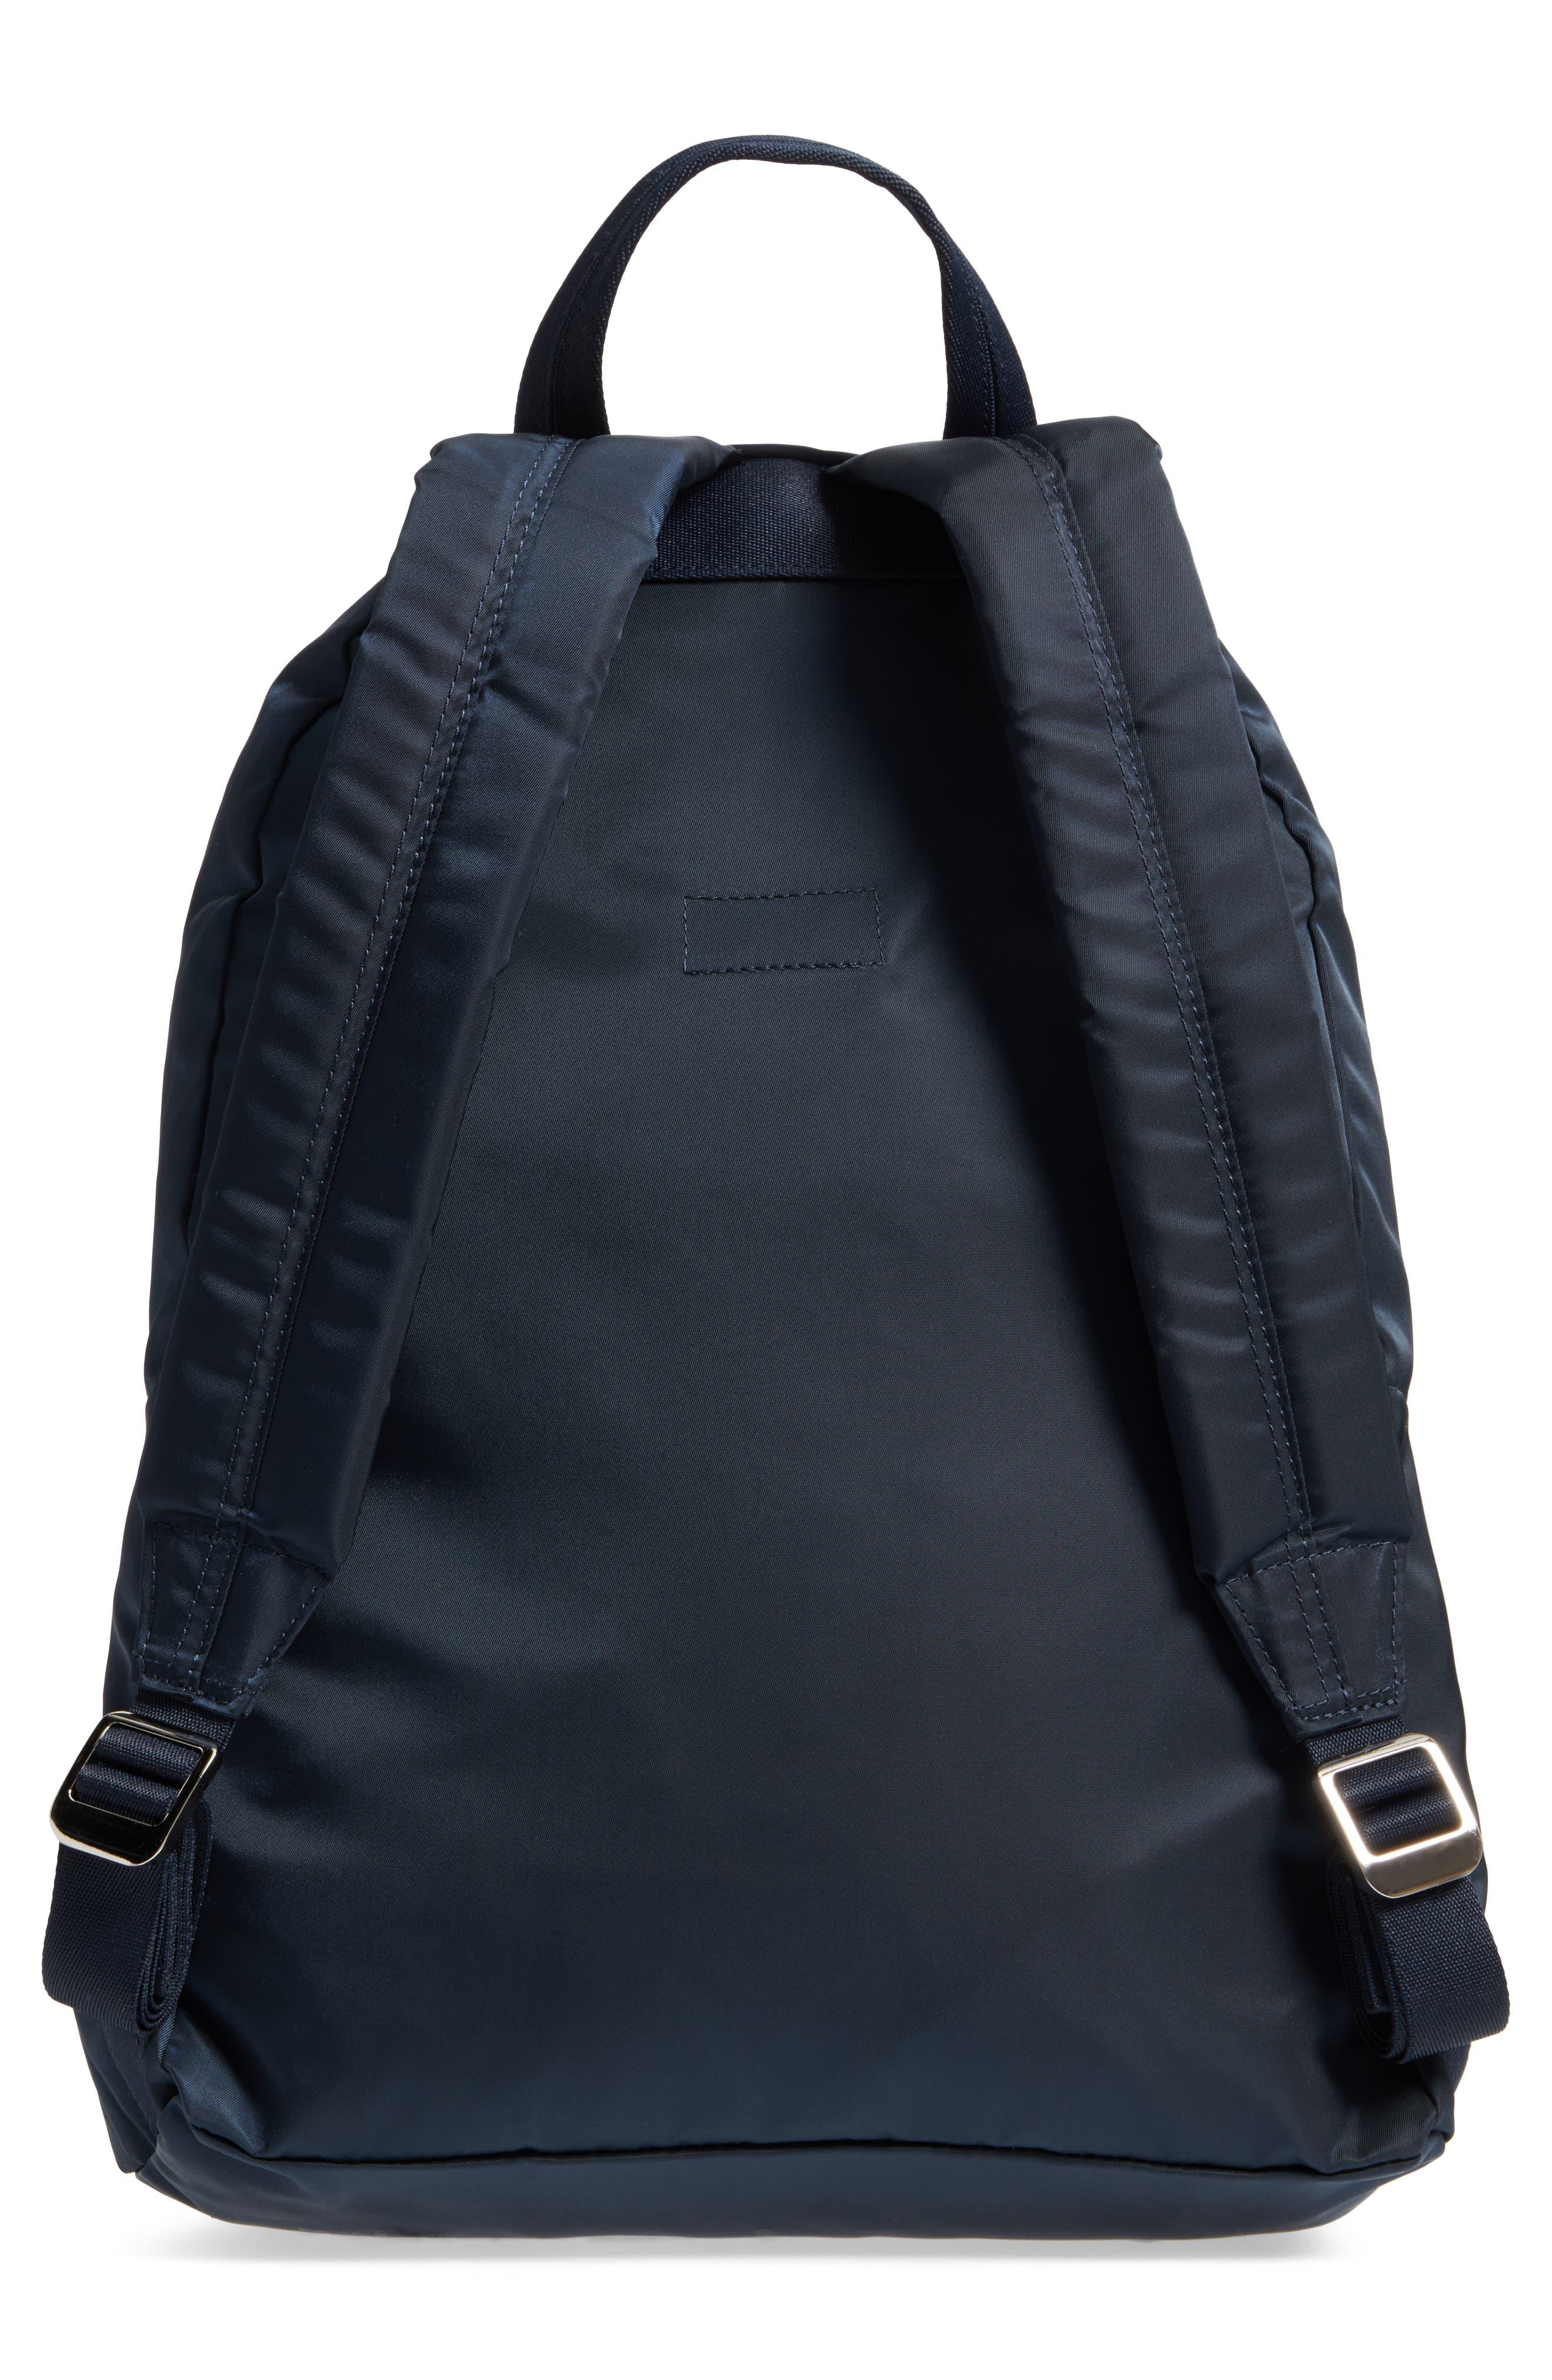 Porter-Yoshida & Co. Daily Backpack,                             Alternate thumbnail 3, color,                             400